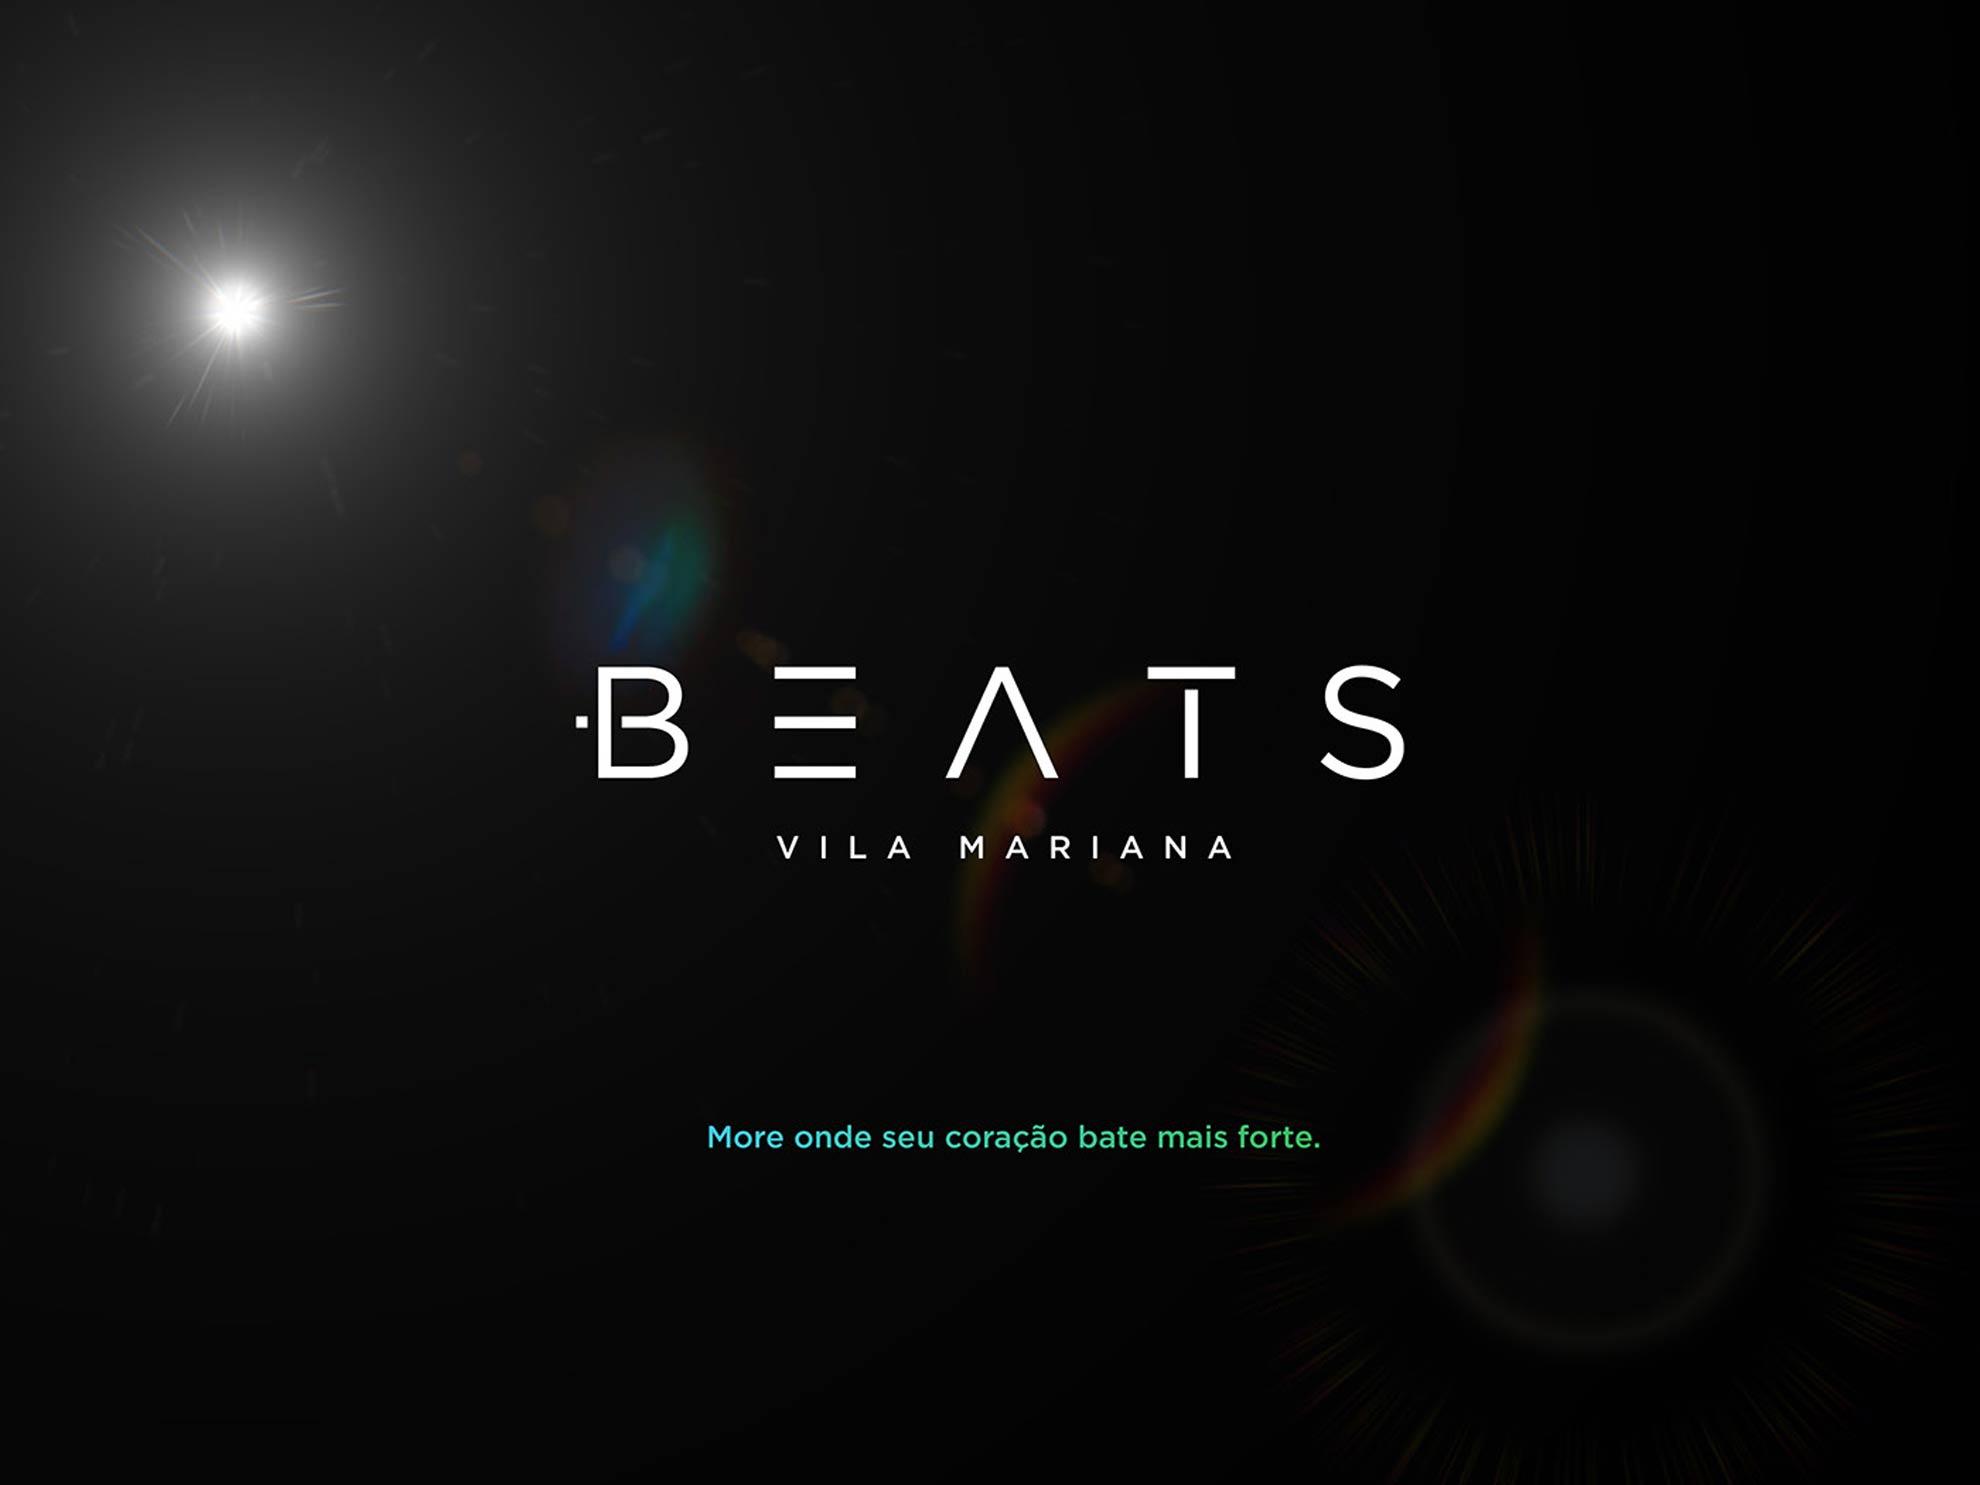 beats-ramonmaia-design-portfolio_8